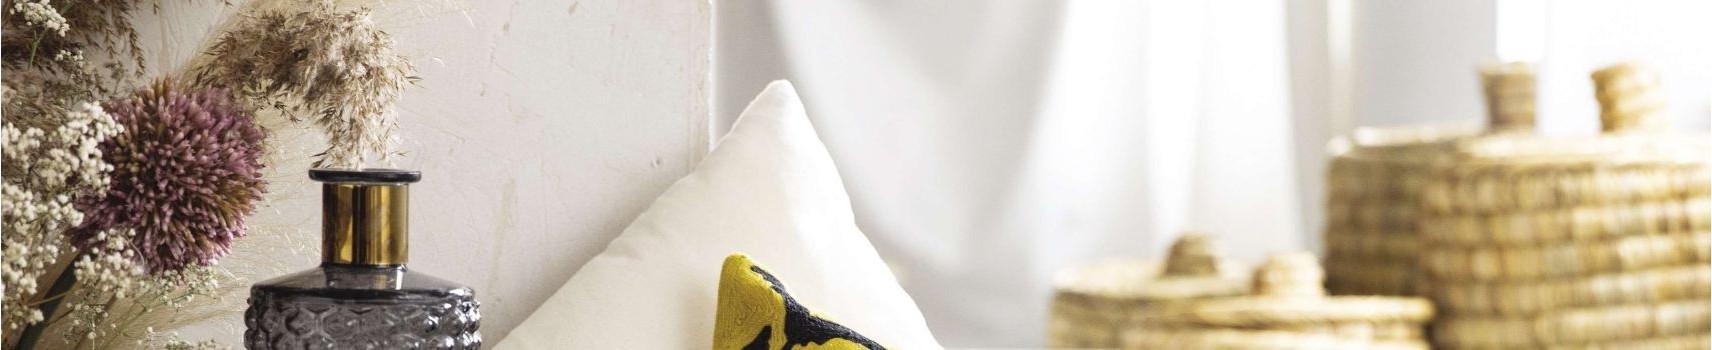 Décoration murale : horloge murale, porte-manteau, cadre photo |Yesdeko